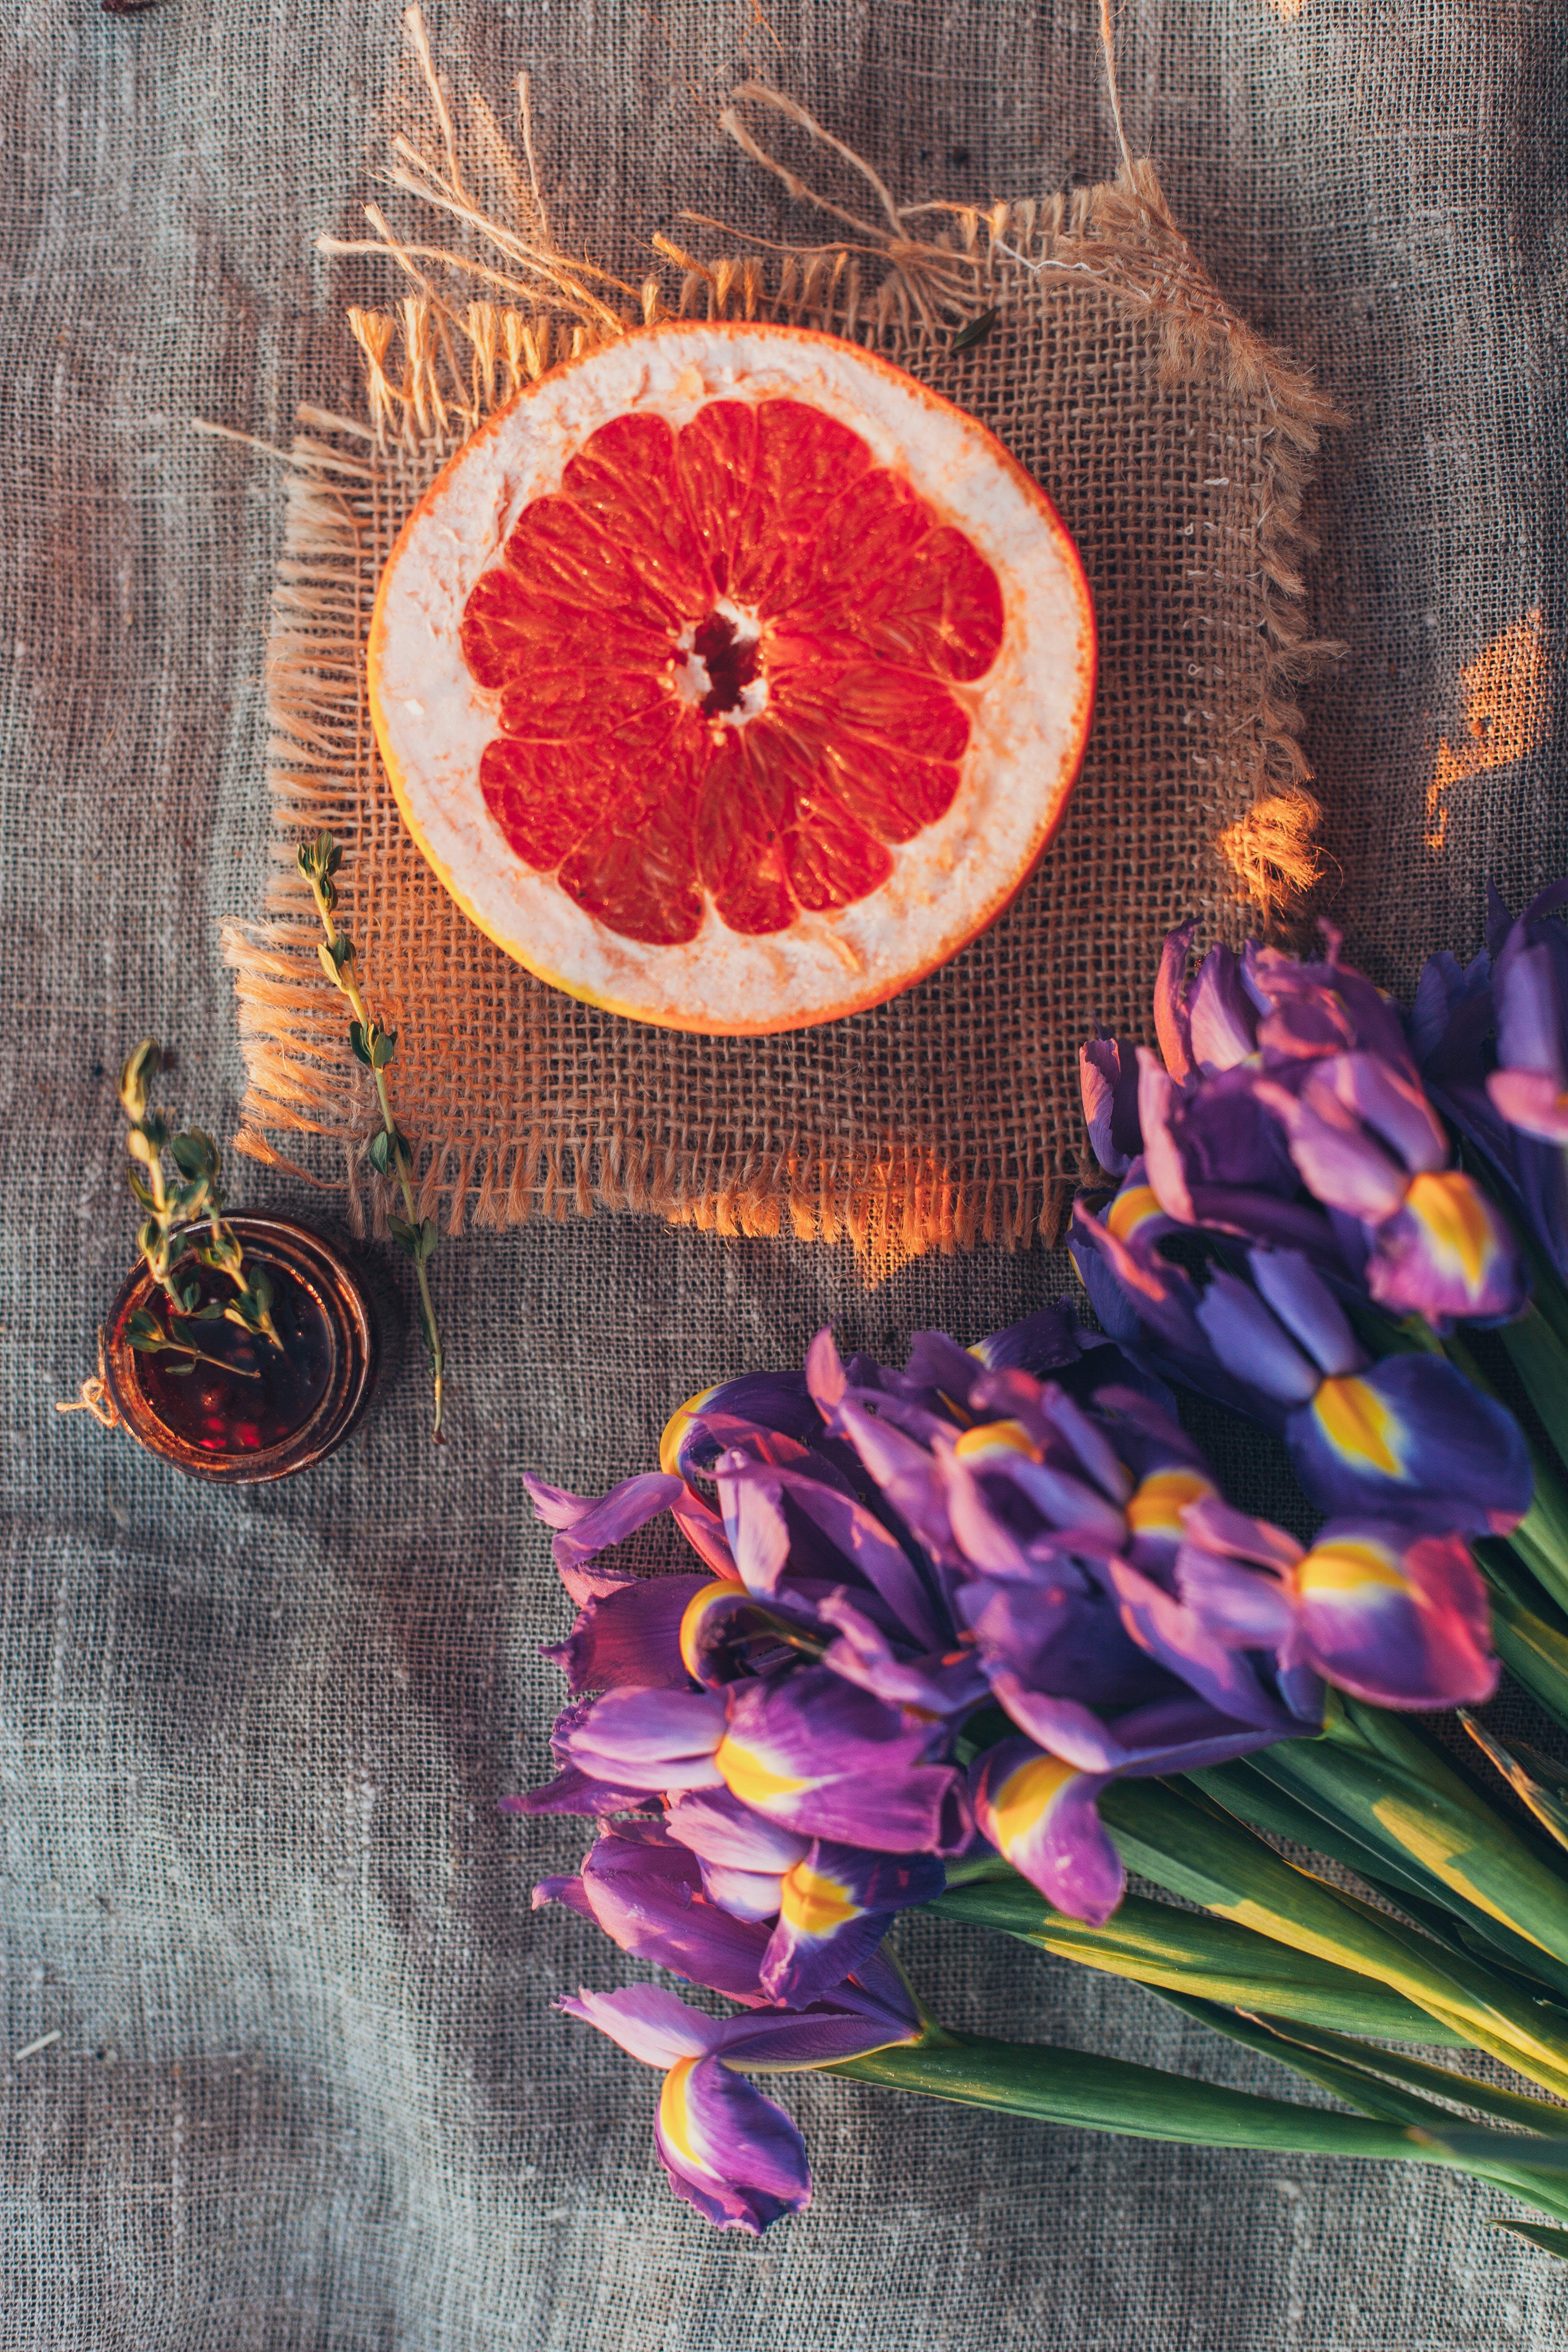 Top View Photo of Sliced Orange Near Flowers